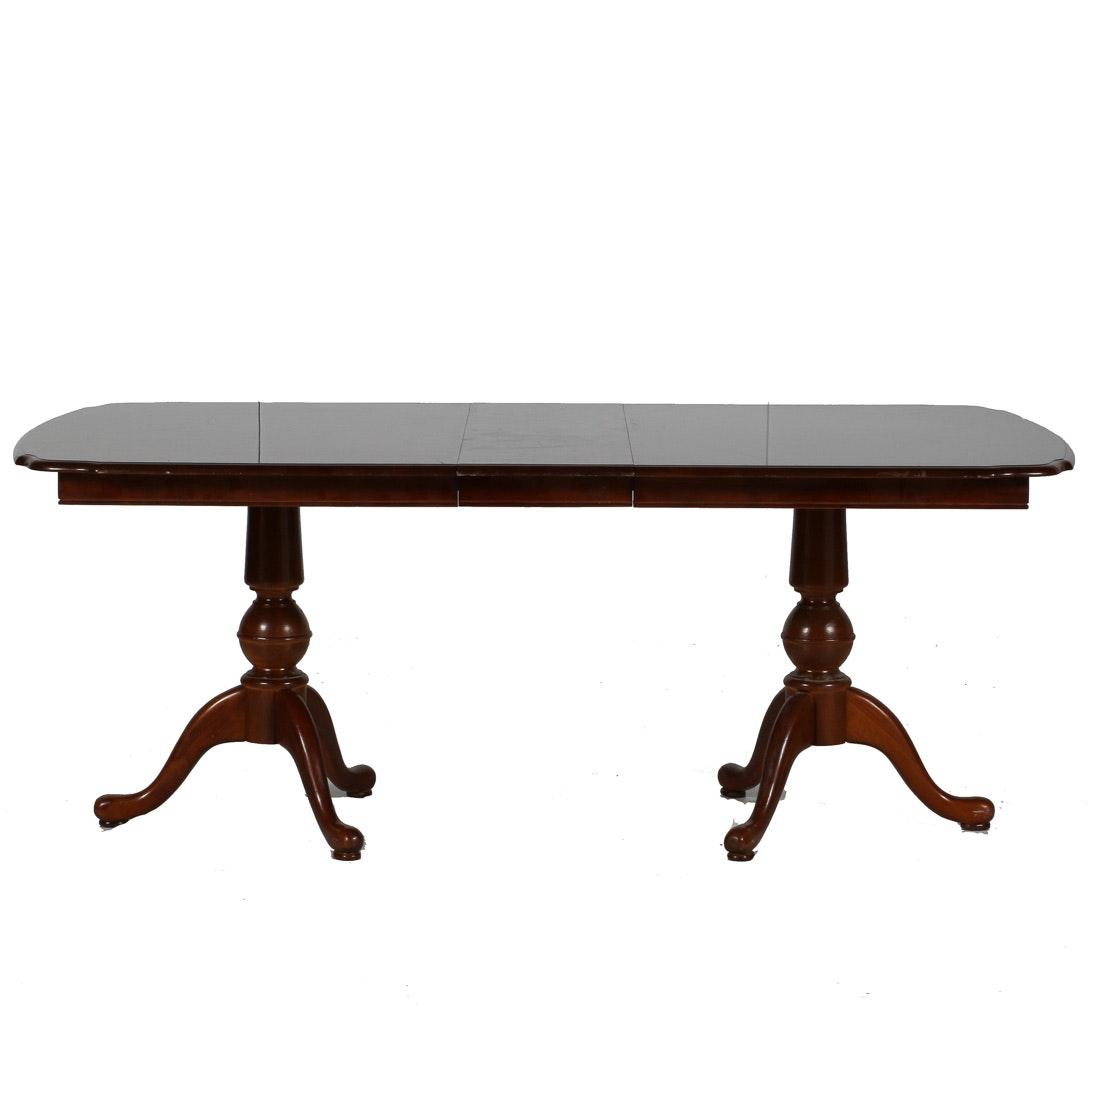 Universal Furniture Queen Anne Style Mahogany Dining Table  : JBBPJMe 0885jpgixlibrb 11 from www.ebth.com size 880 x 906 jpeg 42kB